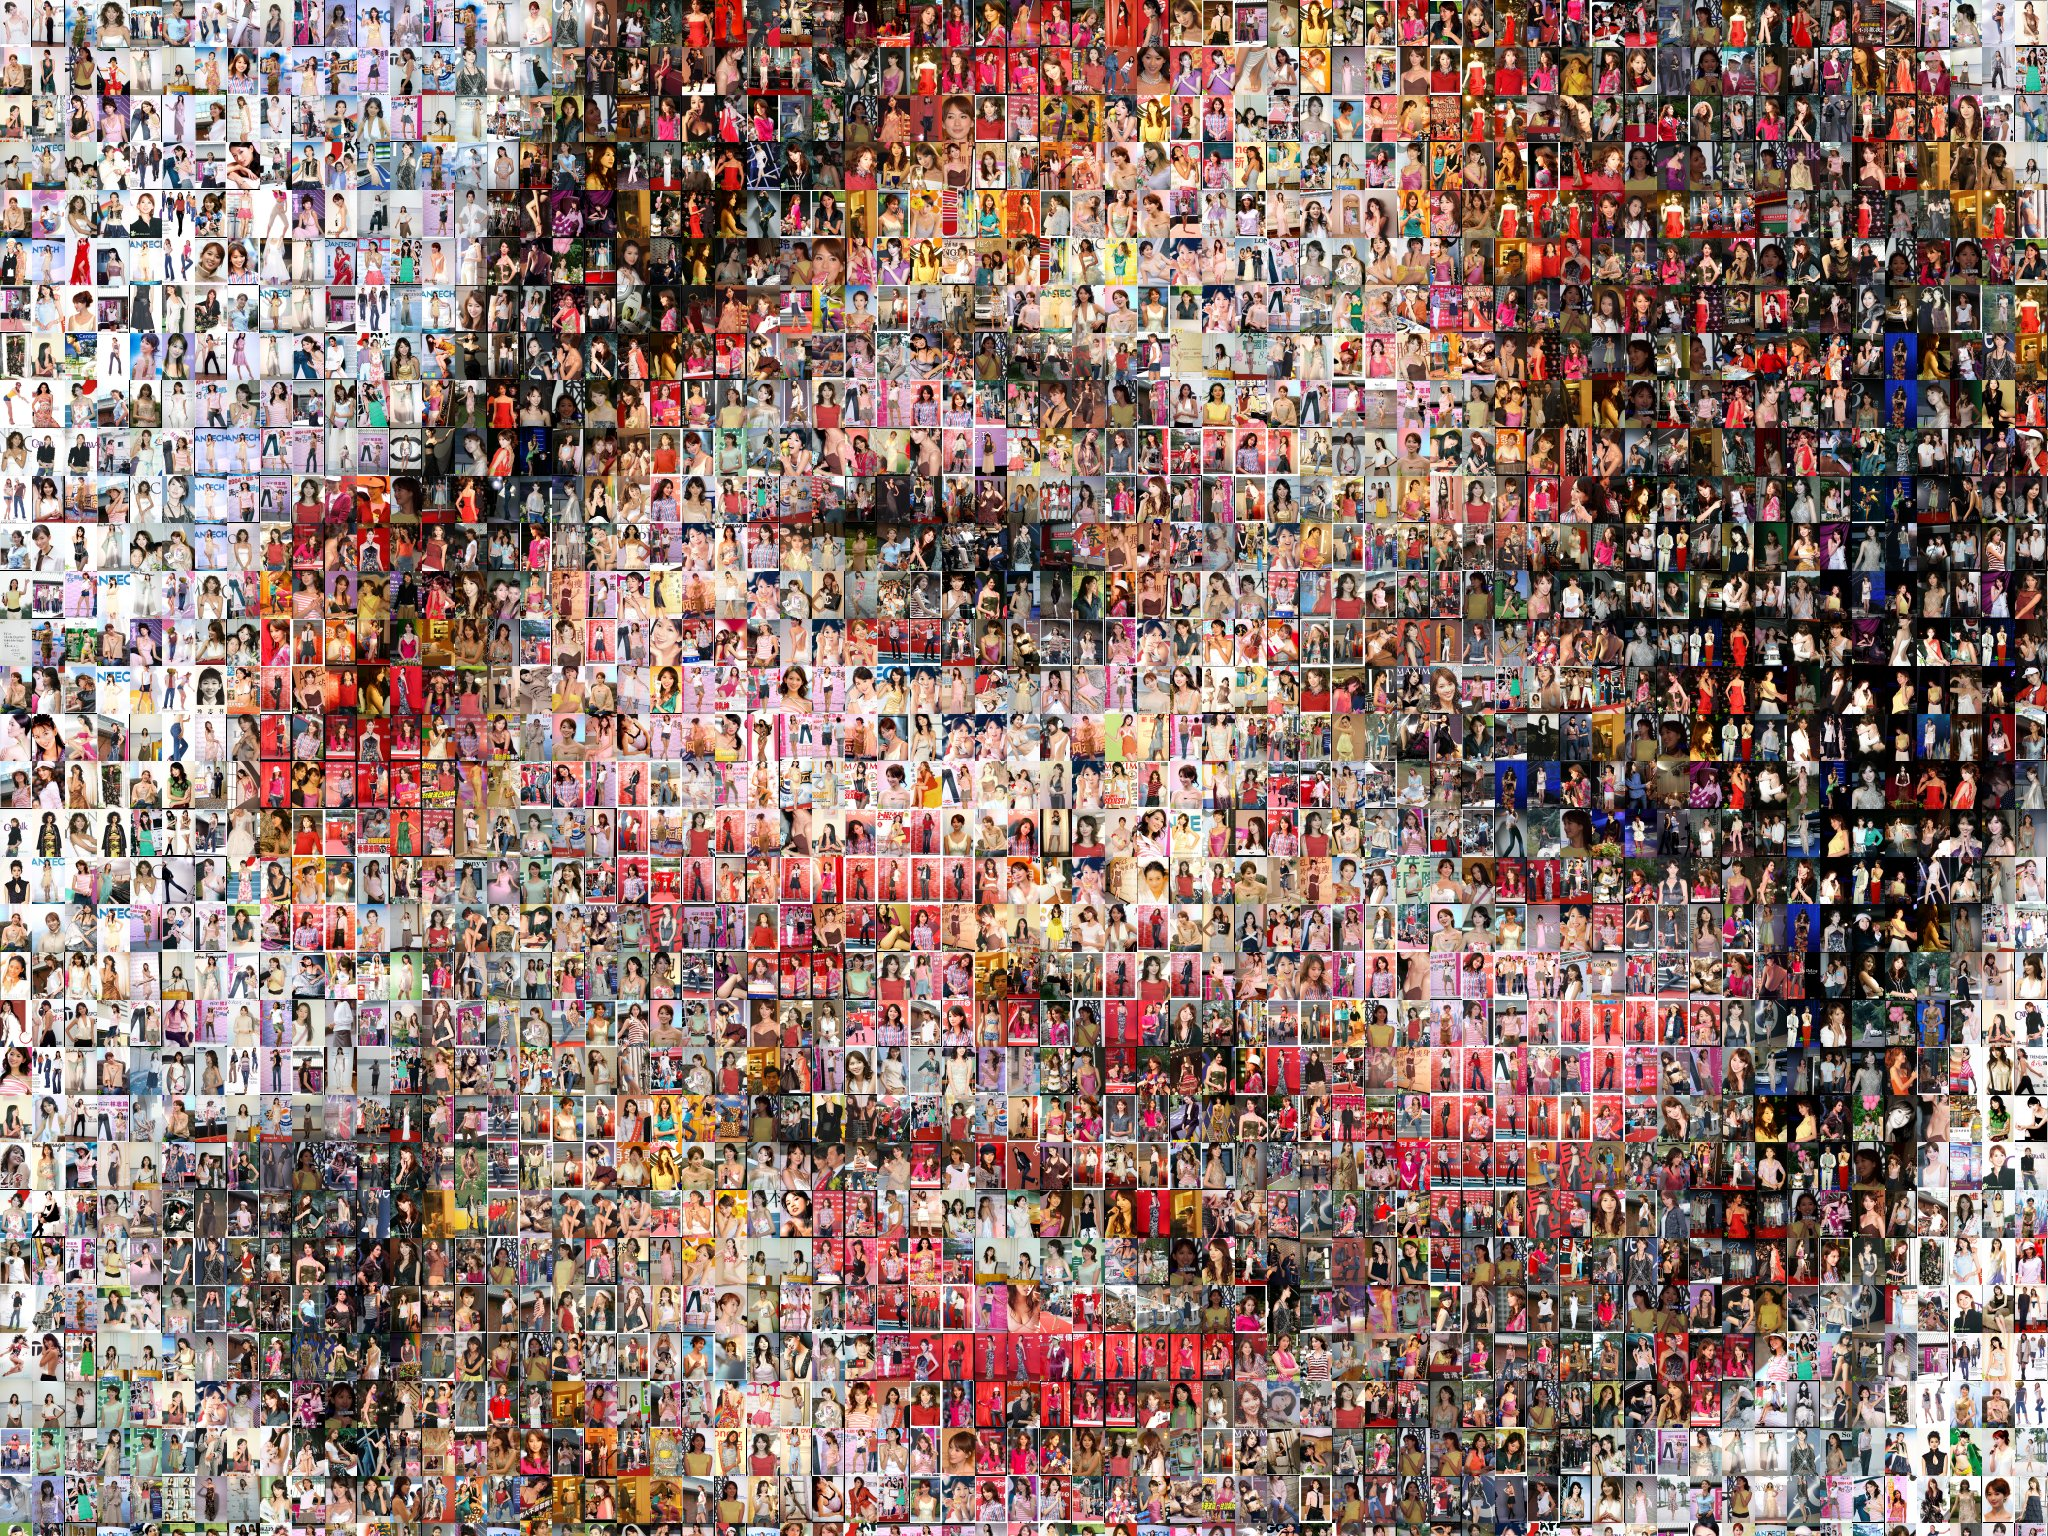 Photo mosaic credit to http://pigeond.net